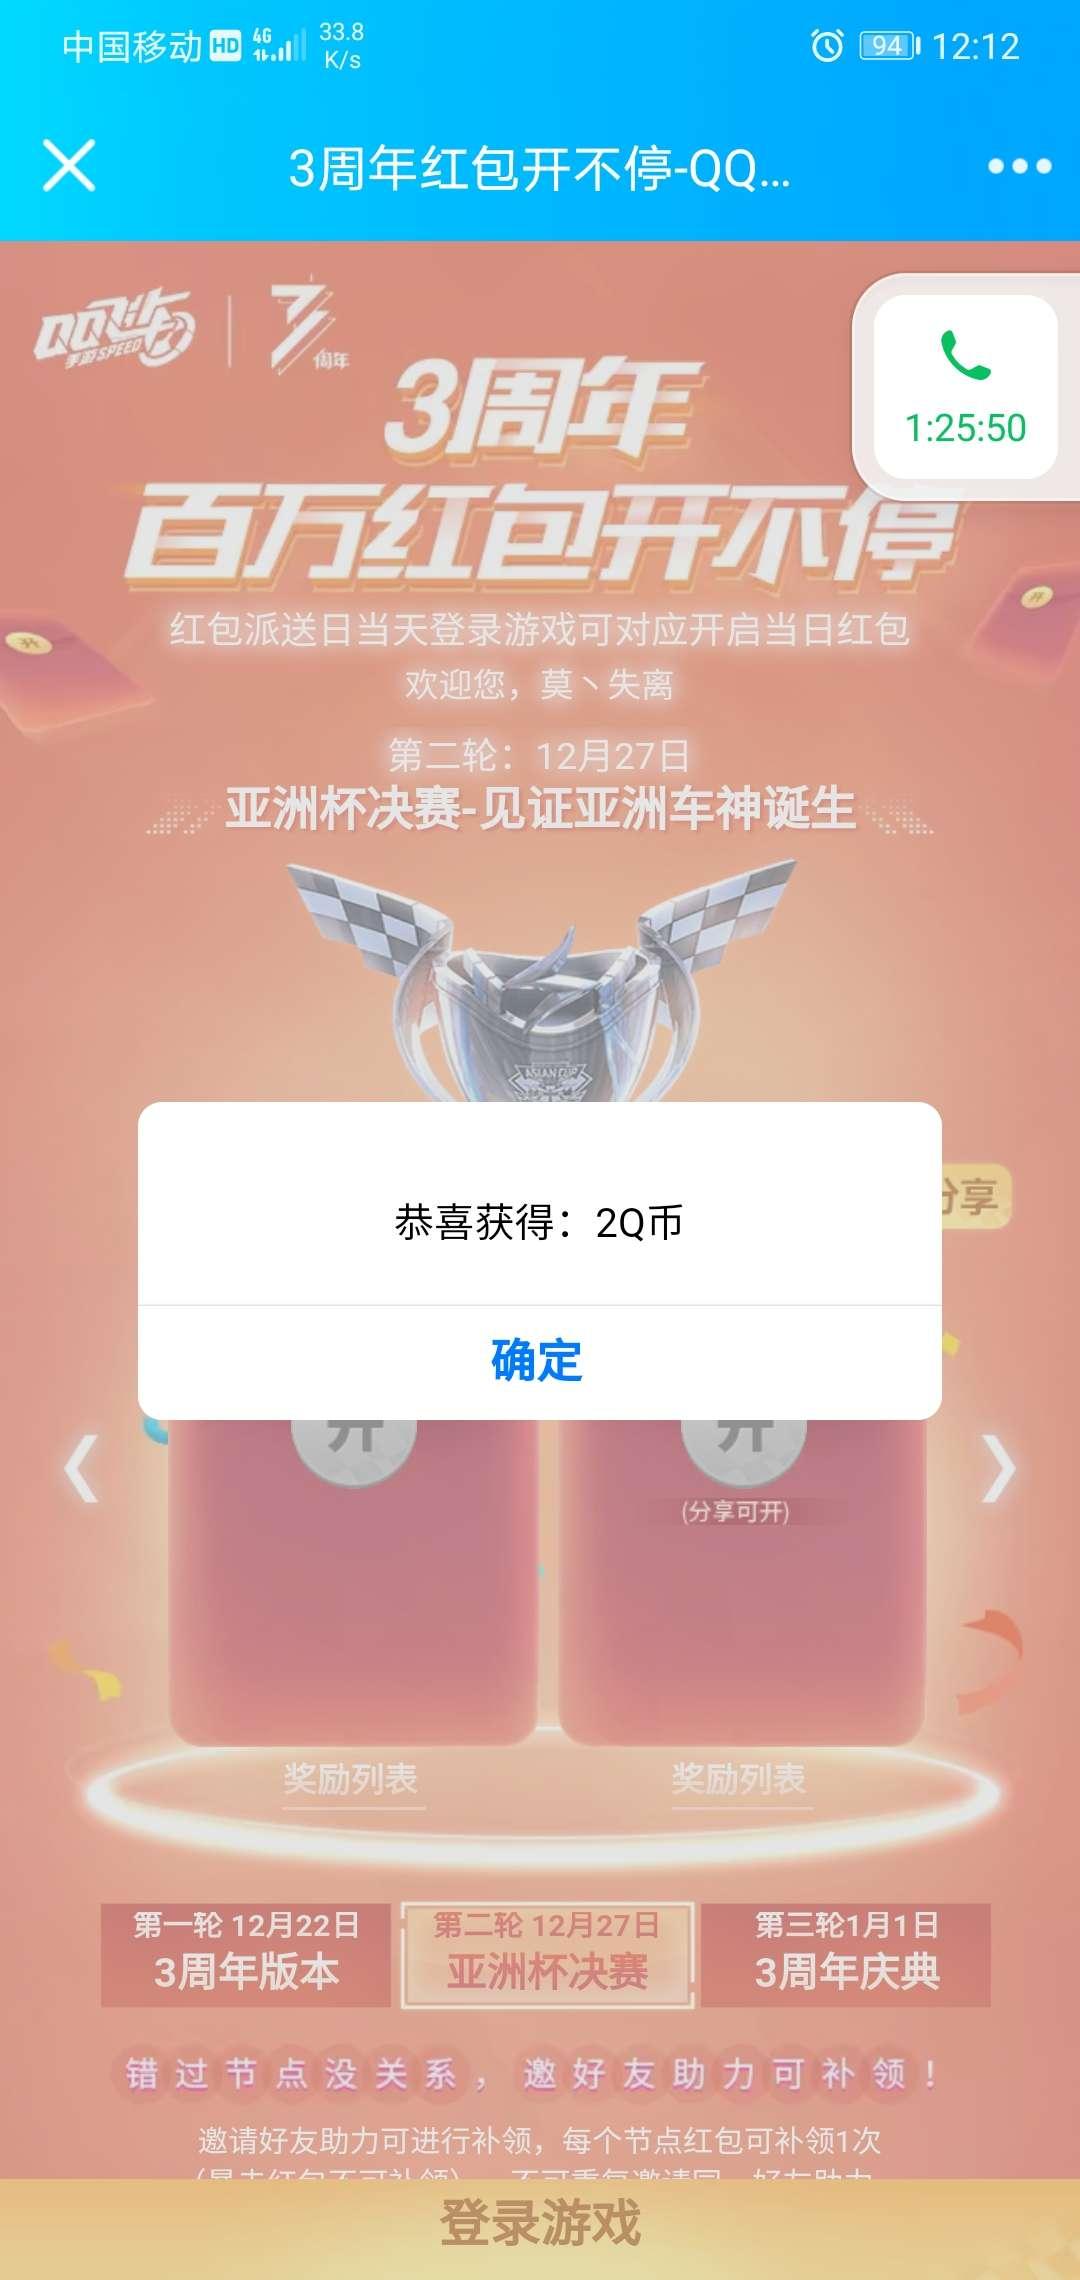 QQ飞车登陆和分享免费2-88Q币插图1